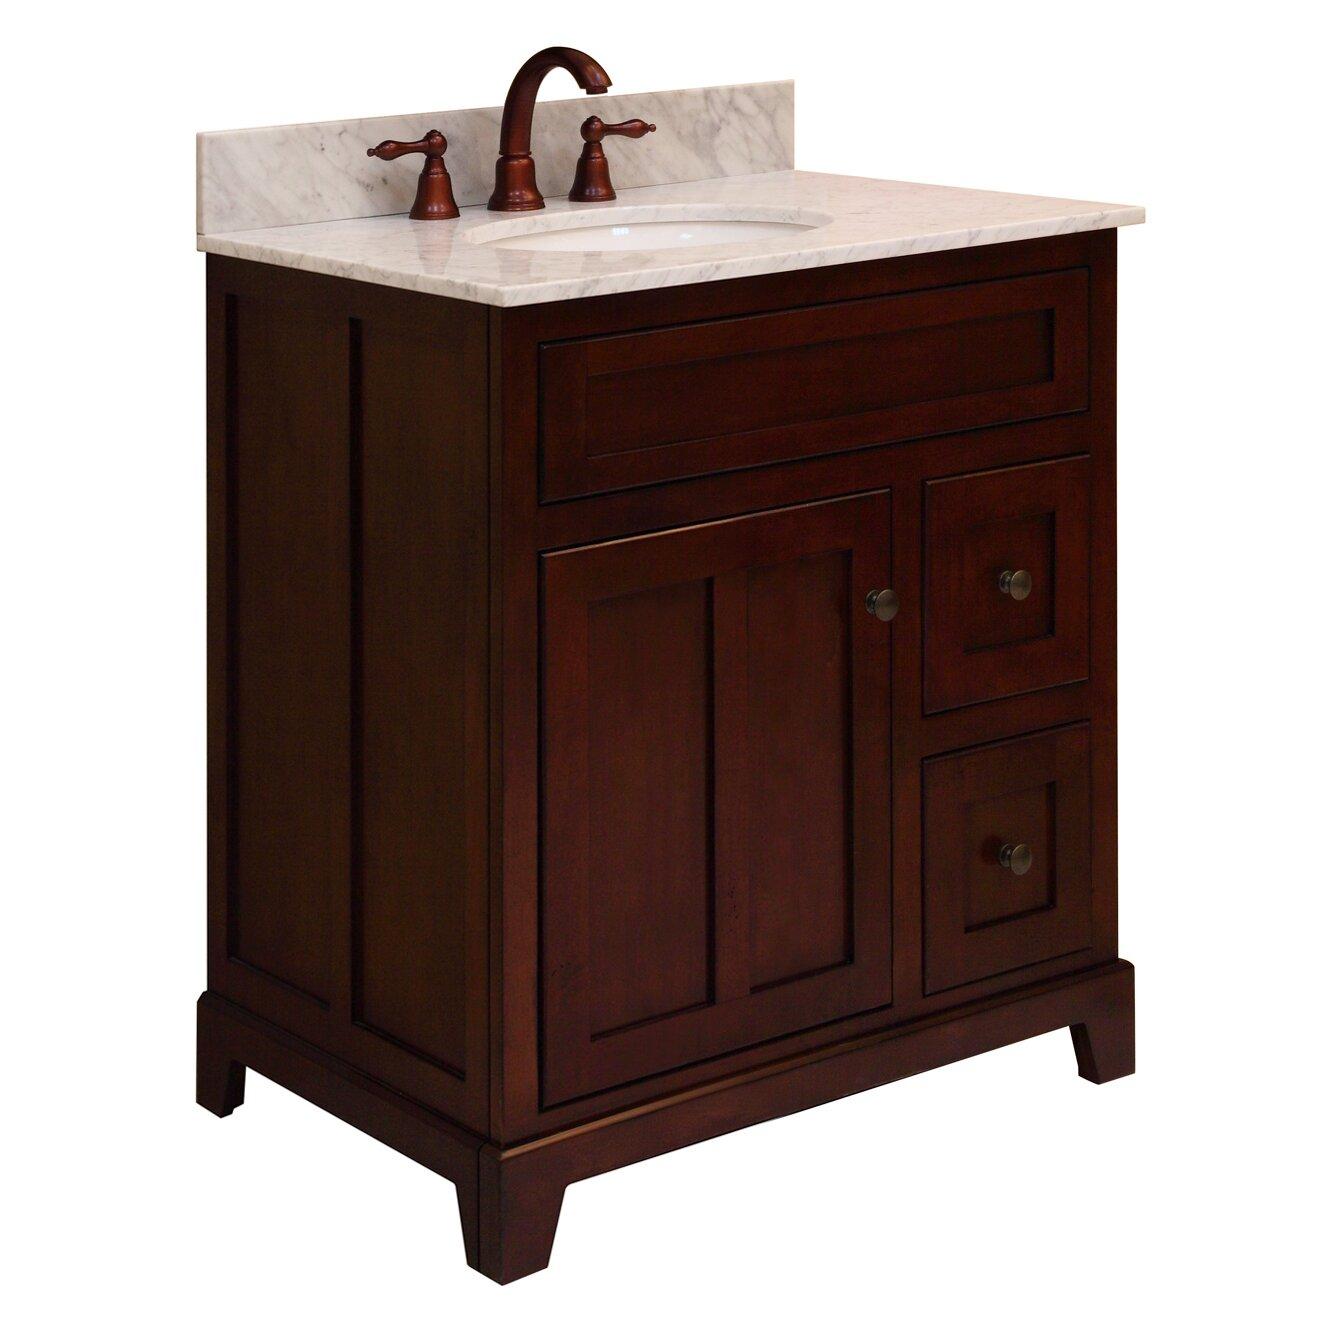 sunny wood grand haven 30 bathroom vanity base wayfair. Black Bedroom Furniture Sets. Home Design Ideas